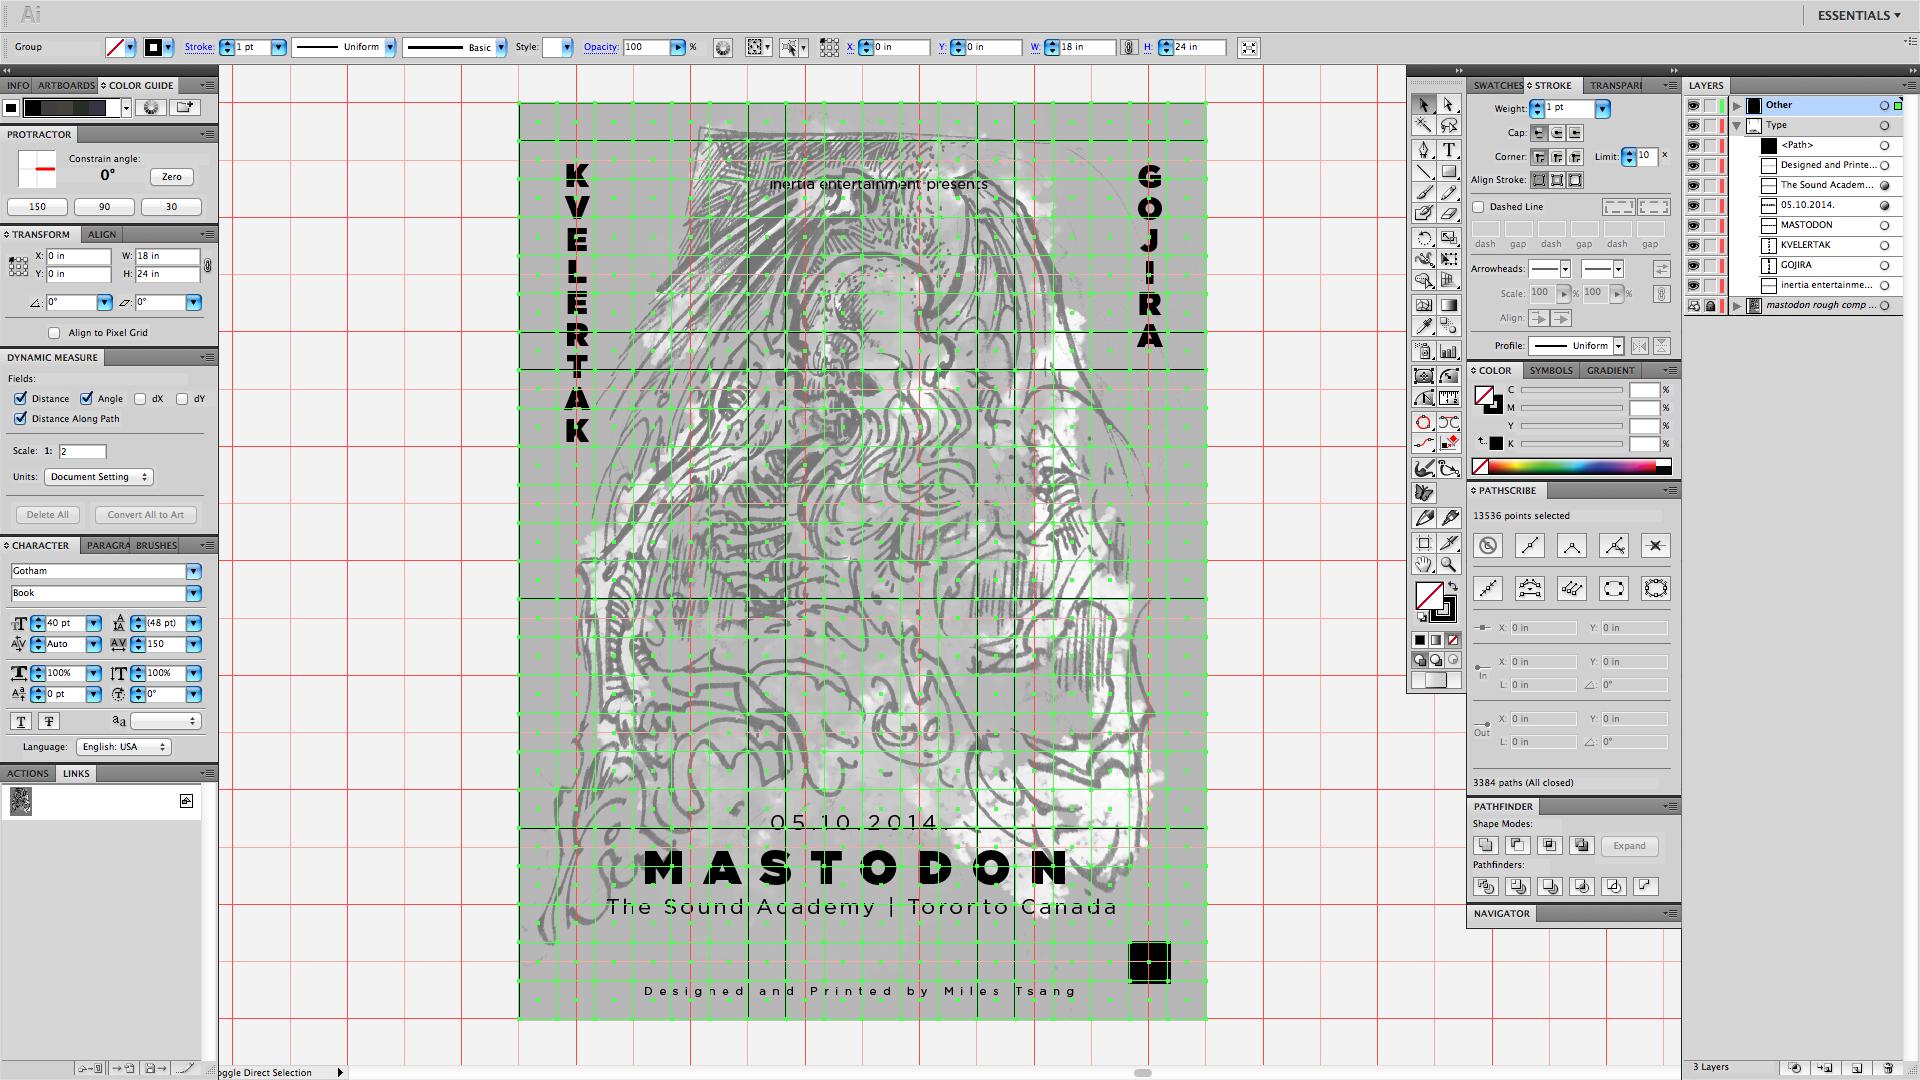 screenprint-mastodon-2014_05_10-02